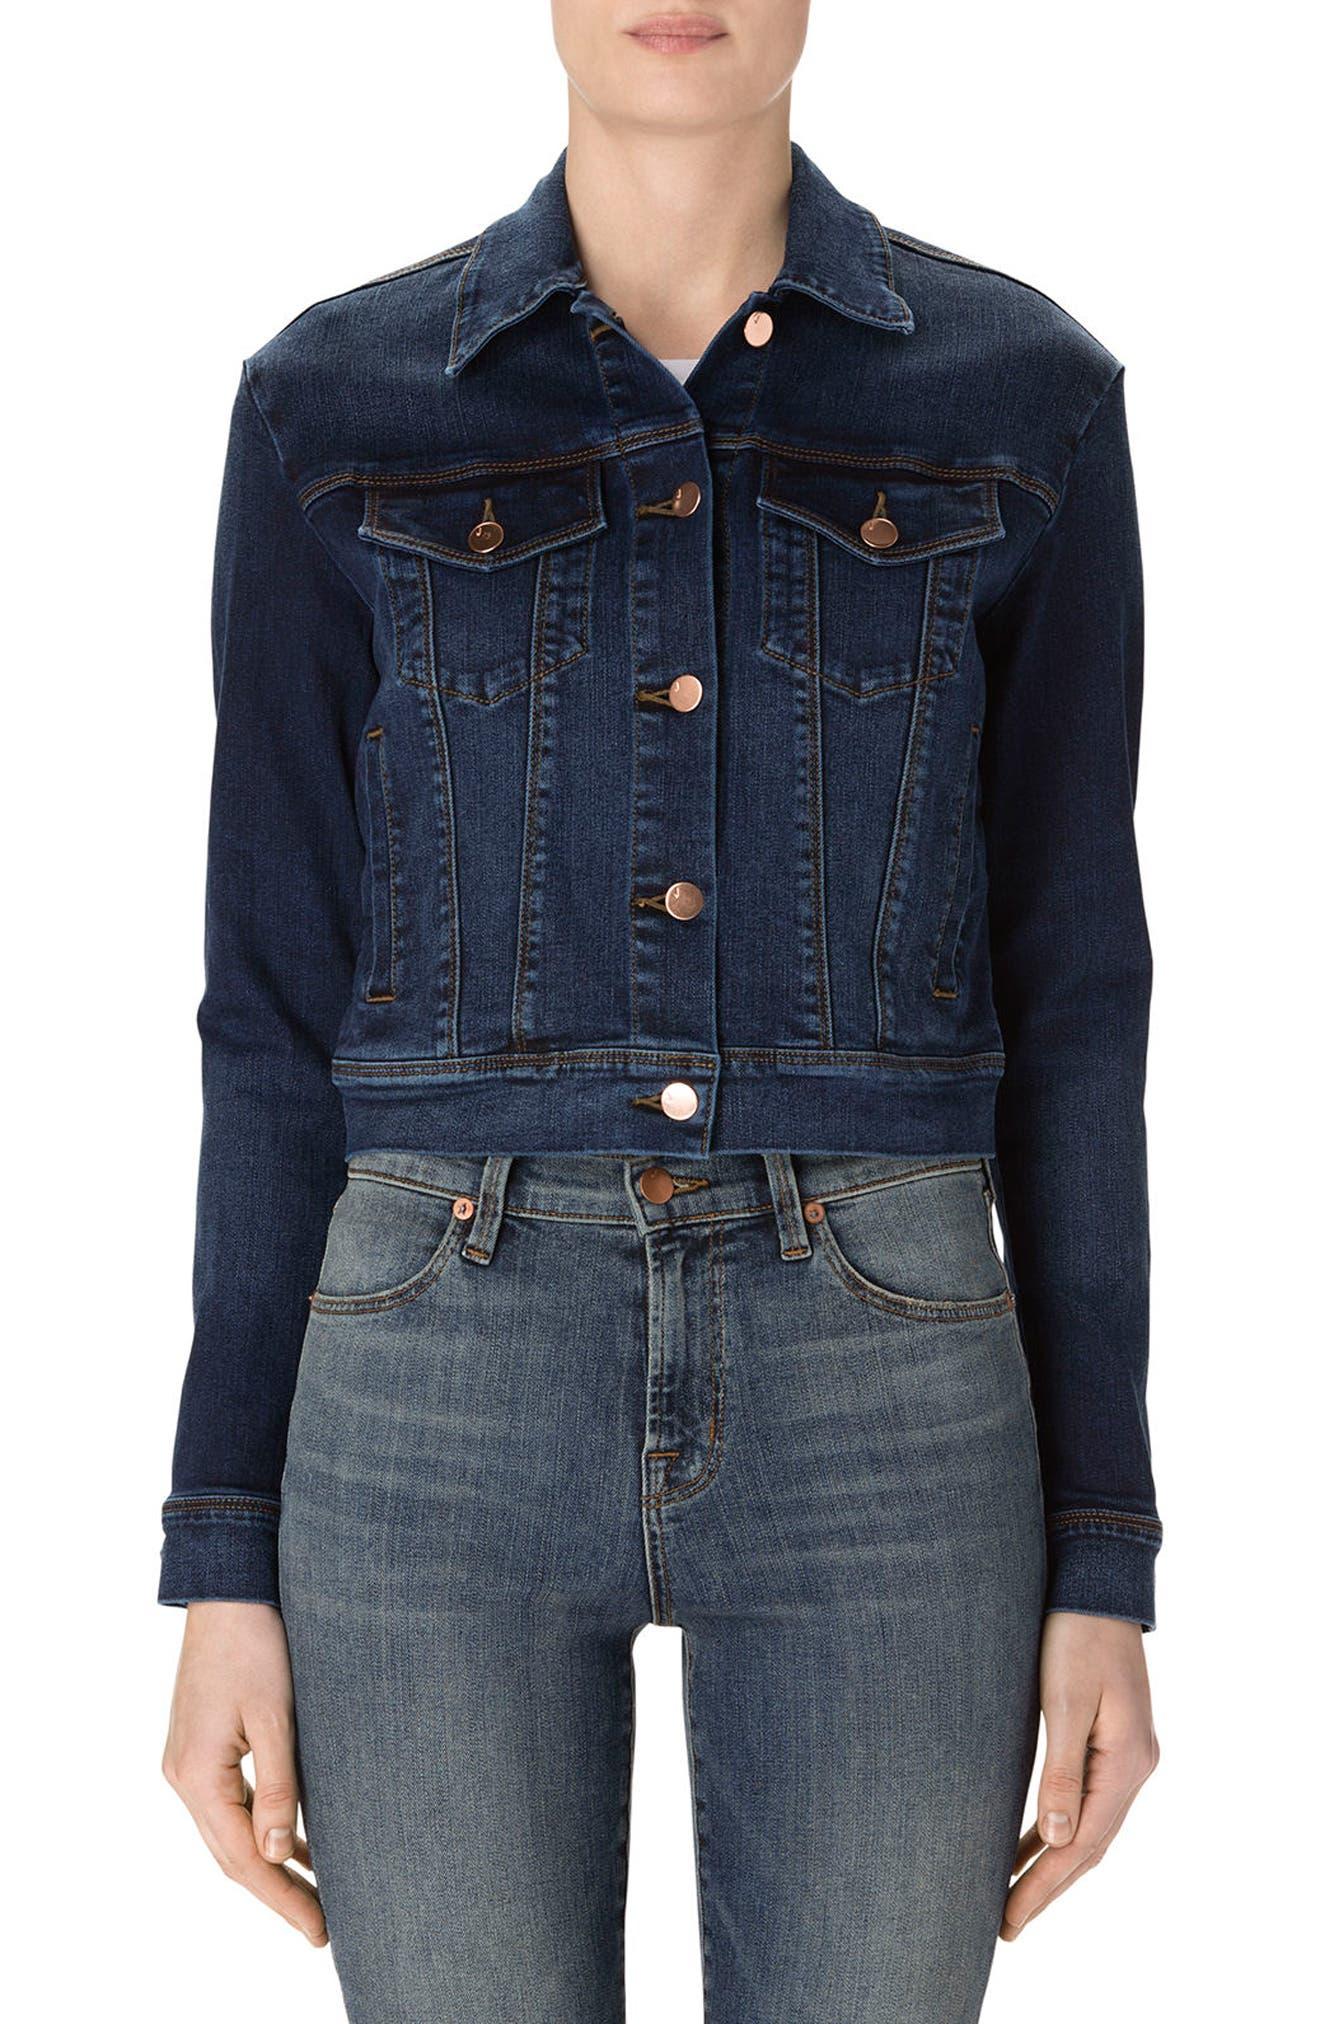 Alternate Image 1 Selected - J Brand Harlow Shrunken Denim Jacket